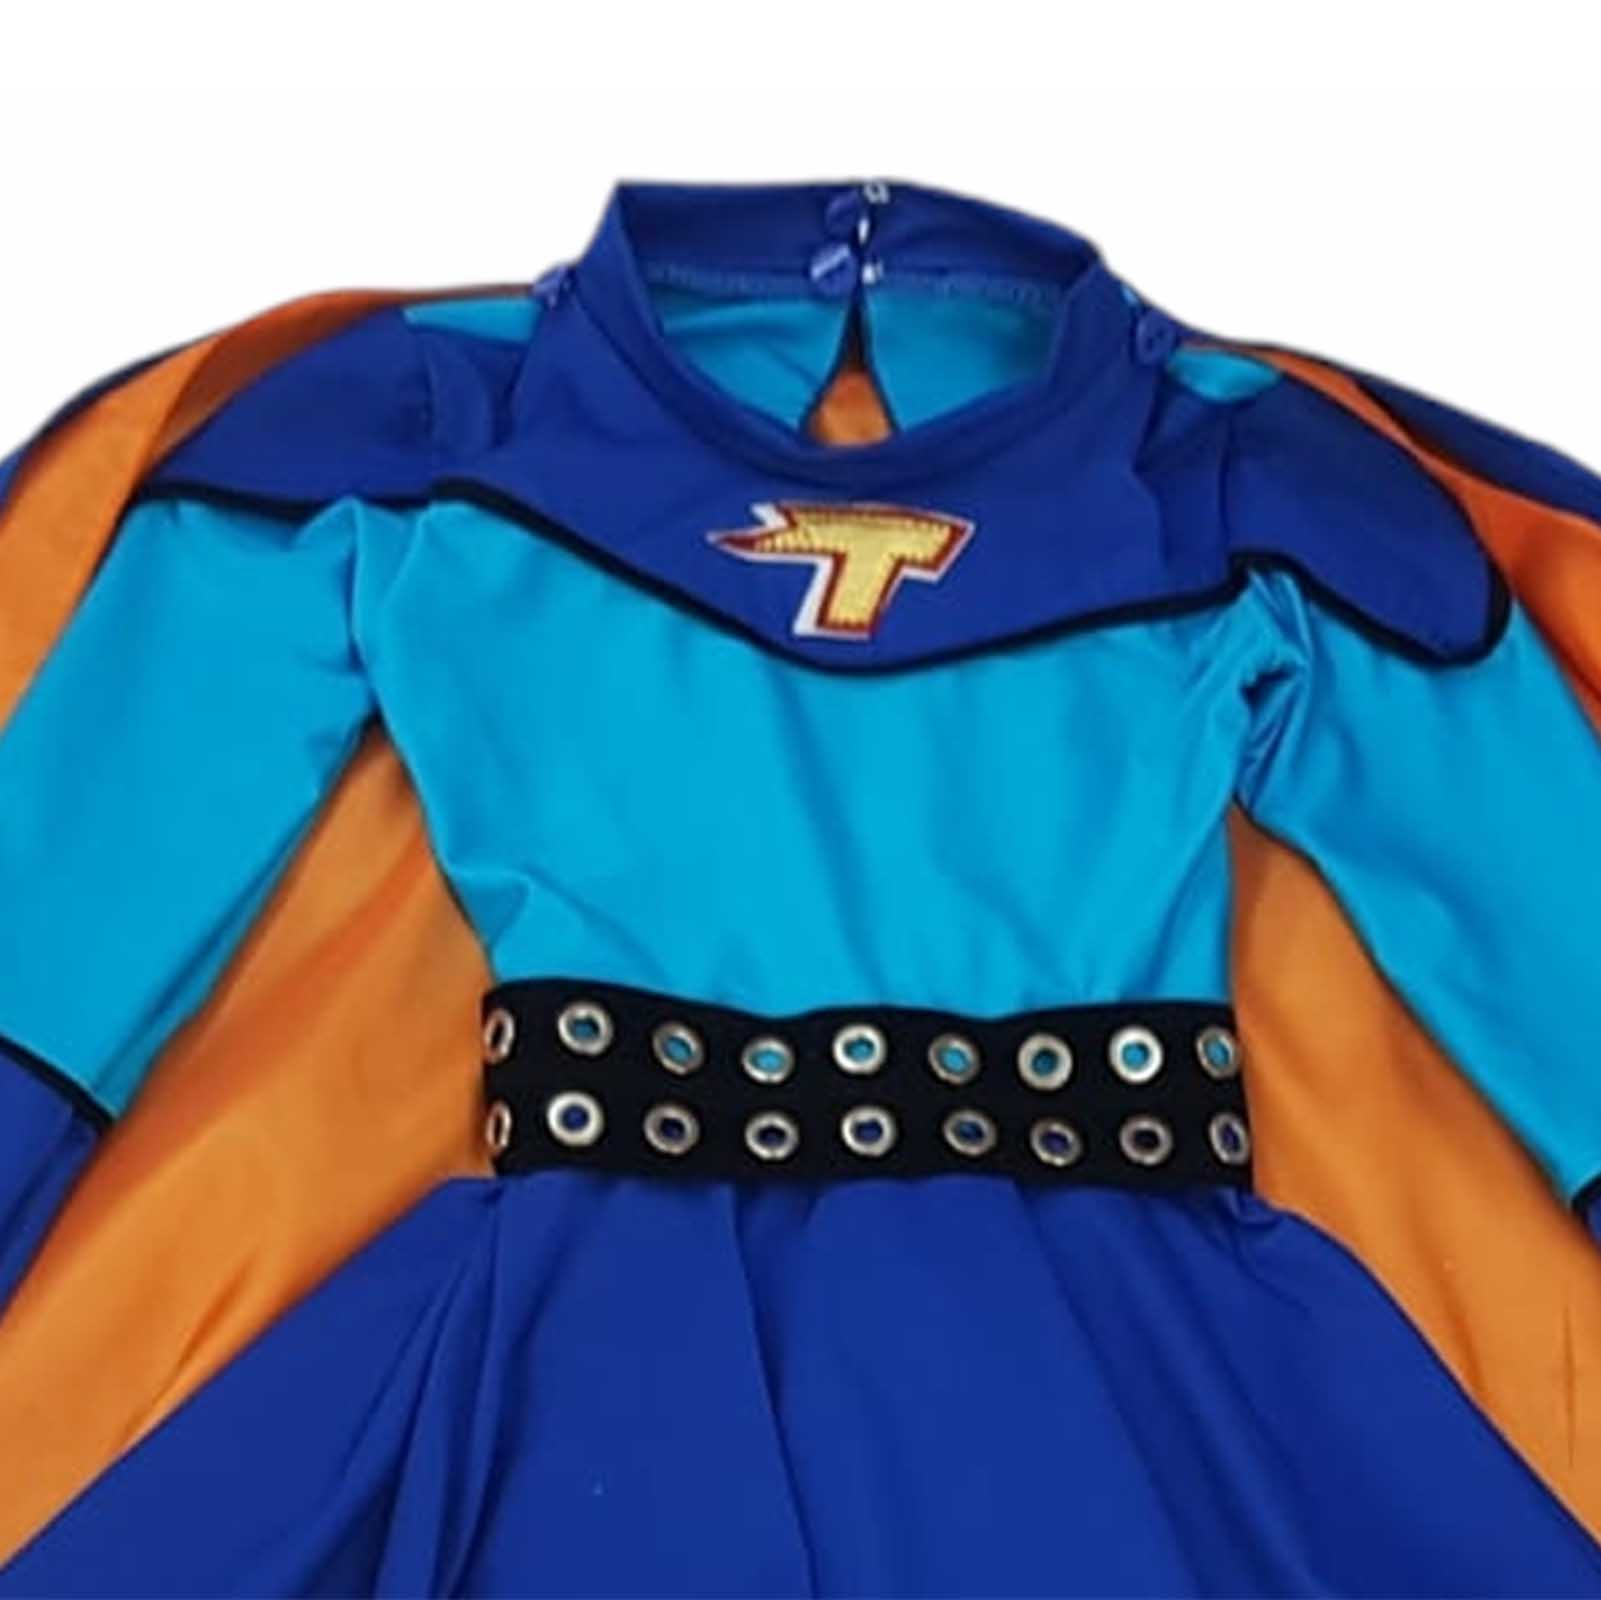 Costum Phoebe Thunderman